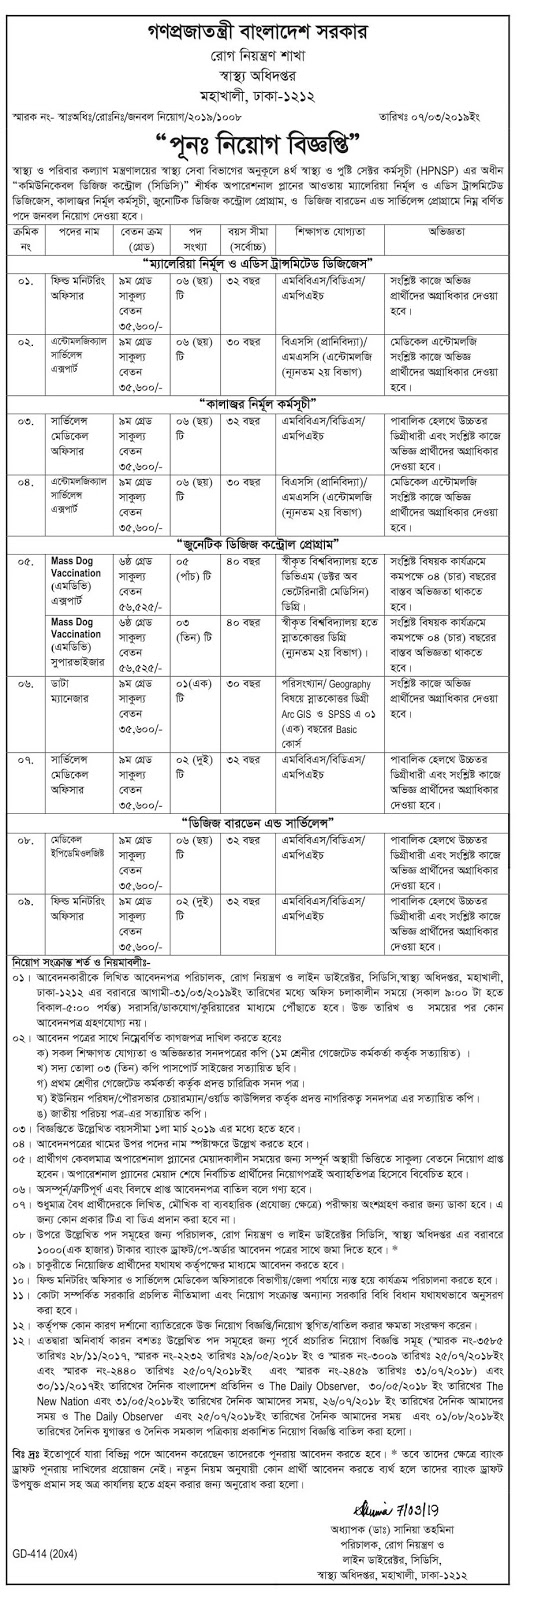 Health department Job Circular 2019  স্বাস্থ্য বিভাগের চাকরির বিজ্ঞপ্তি 2019  SamTipsBD